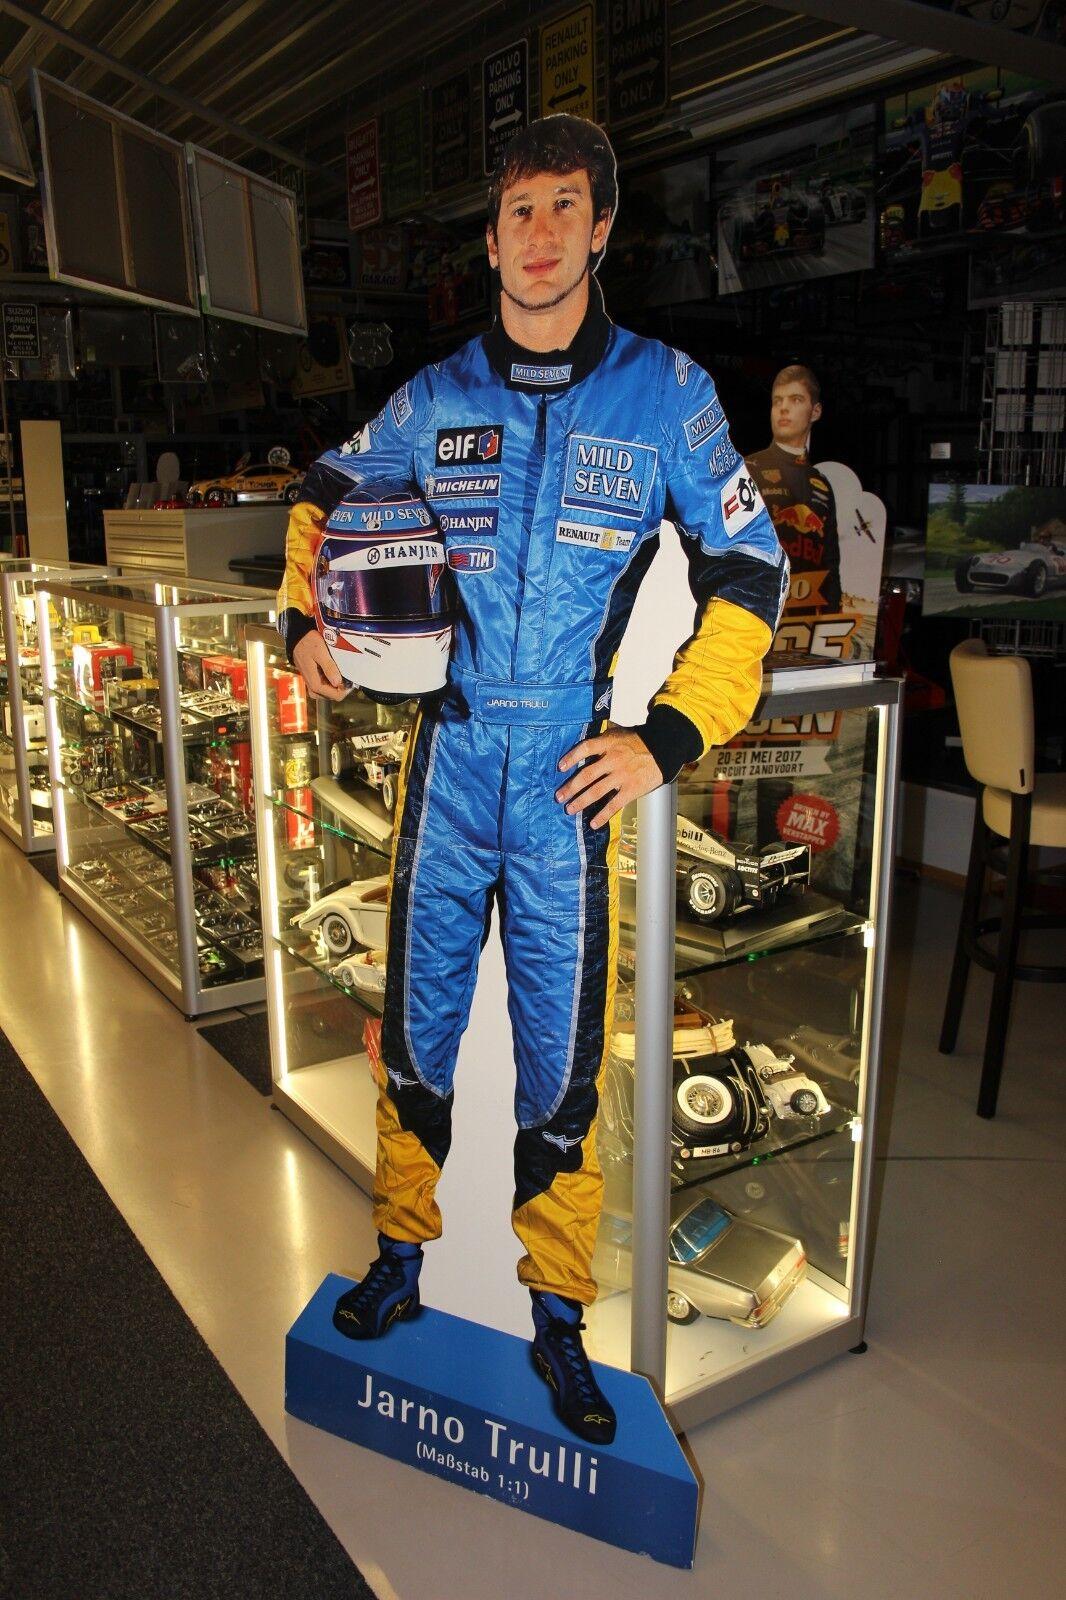 tiendas minoristas Cochedboard Figurine Jarno Trulli Mild Seven Renault F1 F1 F1 Team (height 195 cm)  punto de venta en línea